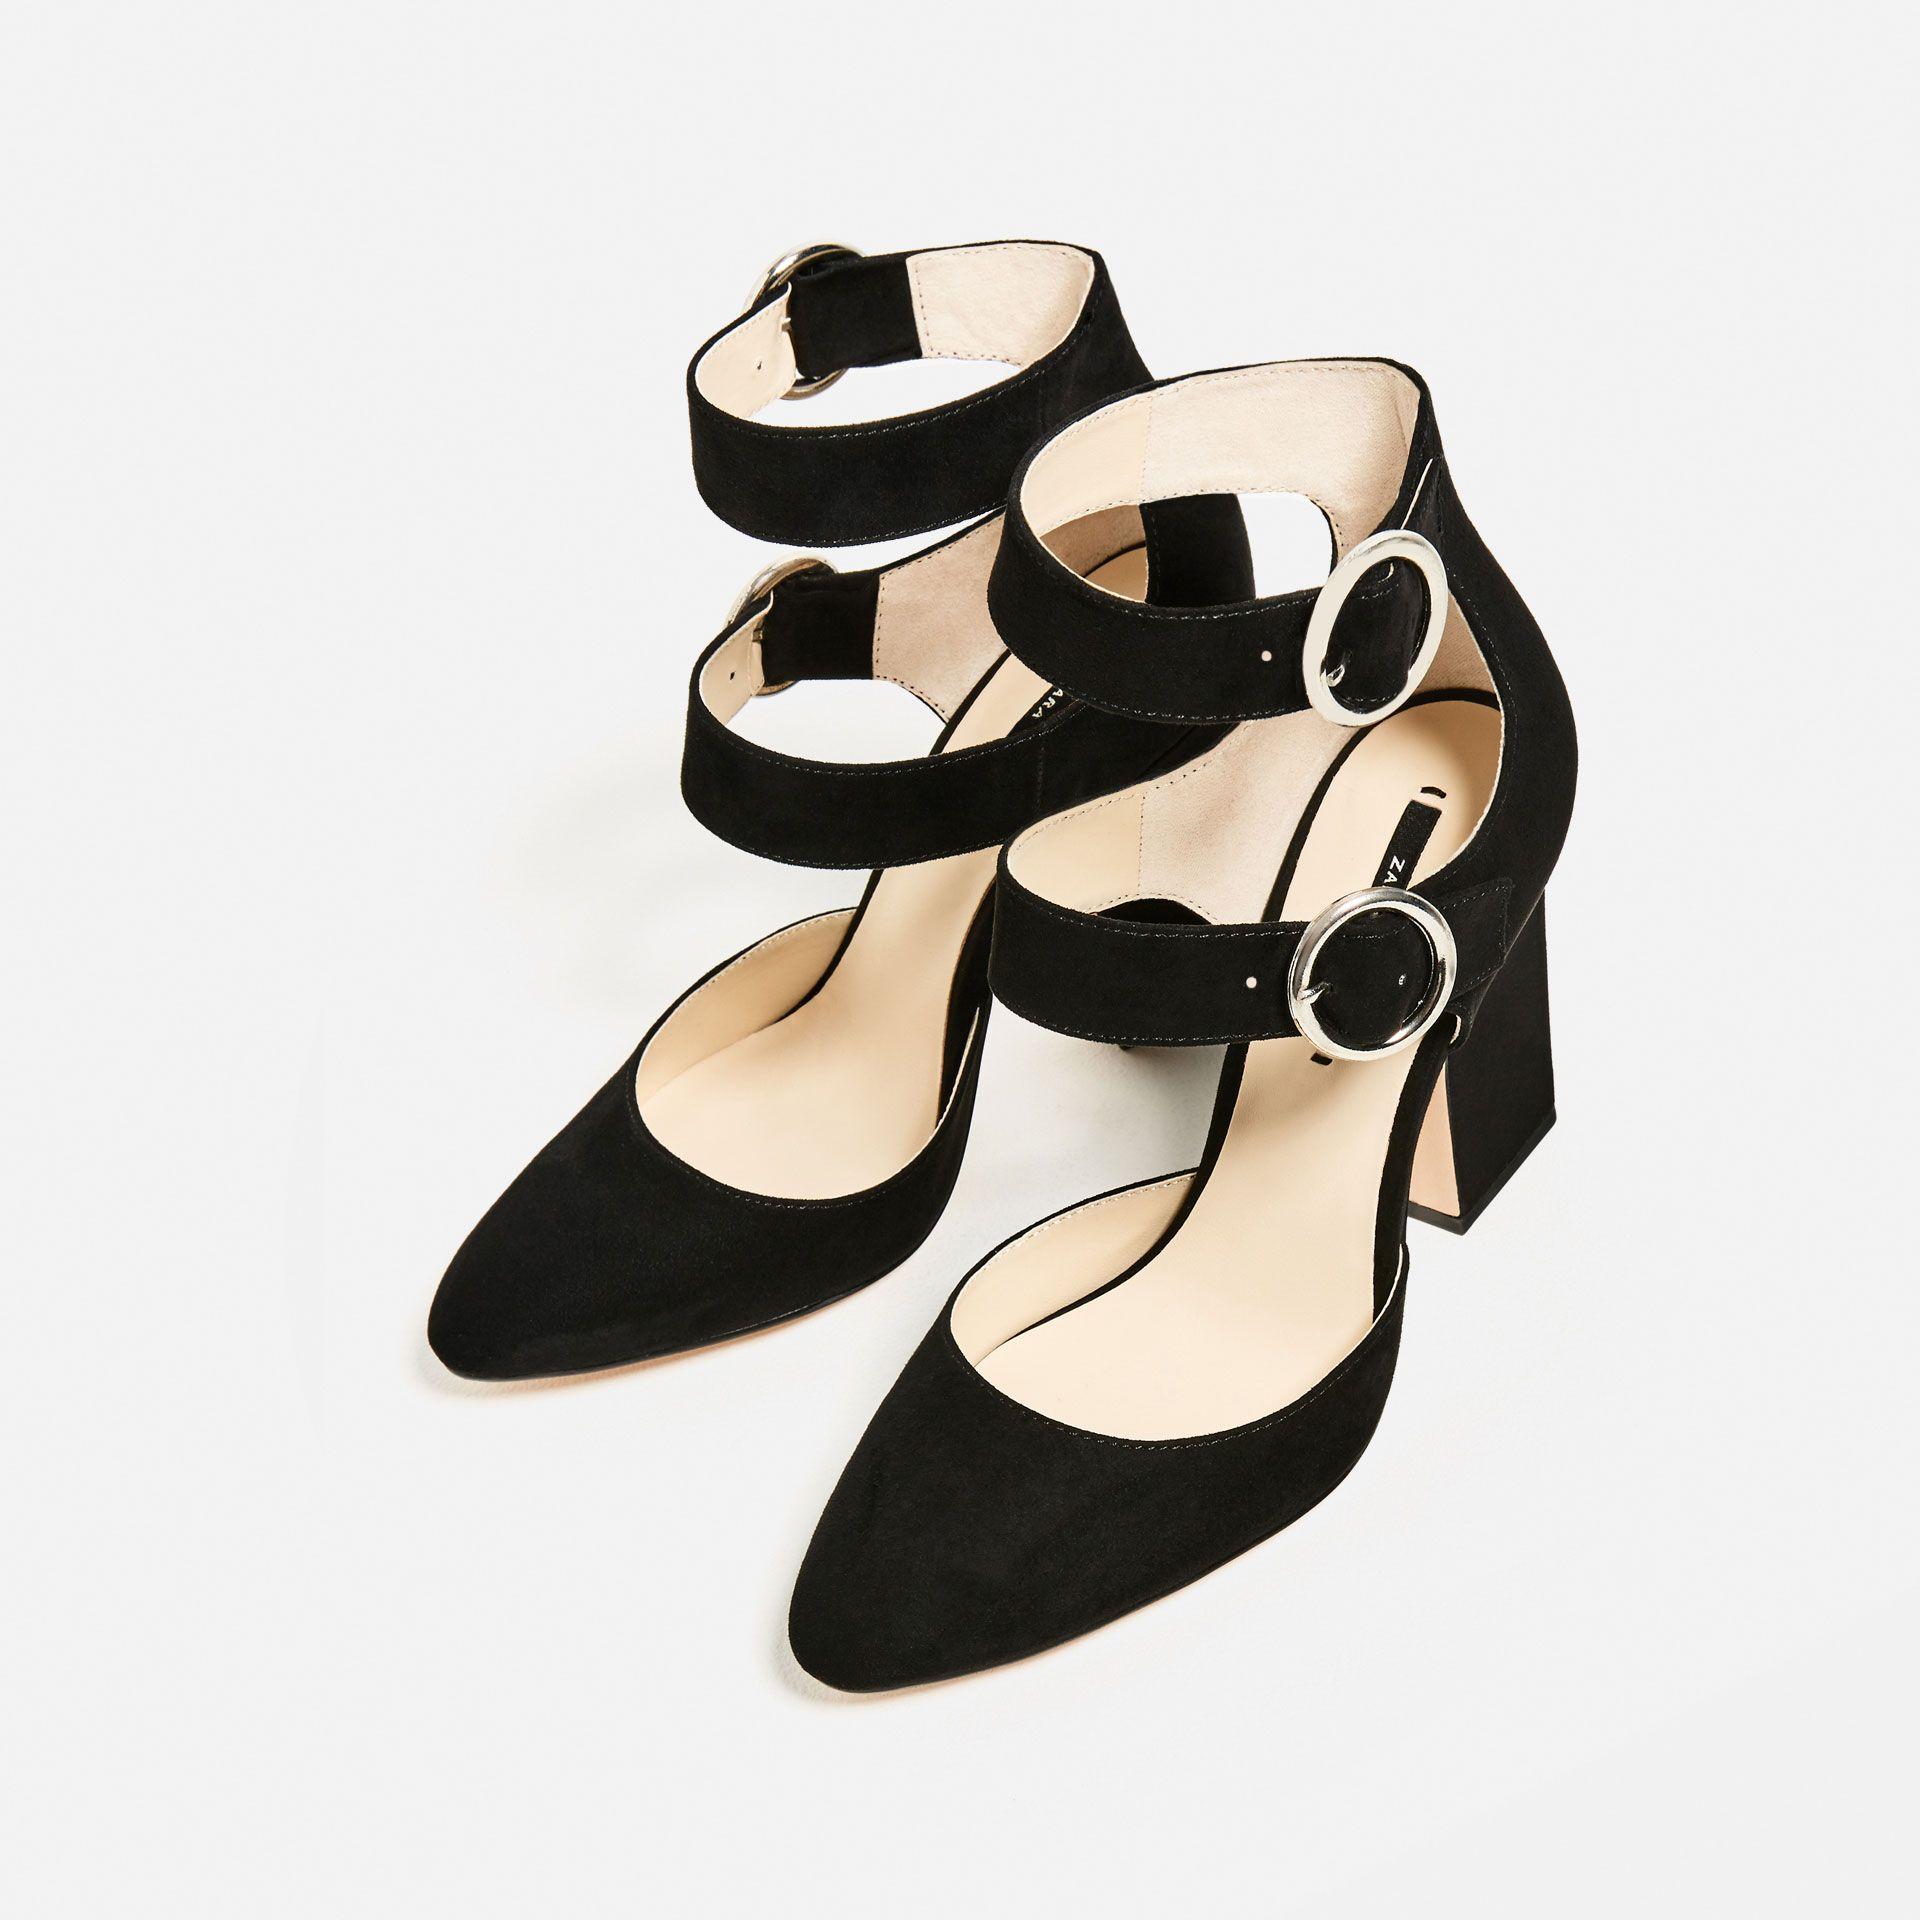 70s Running 420 Pigskin 530 Vazee Zapatos de tacón de color negro con hebilla Fresh Foam Zante v2 p6ikd5Sv2